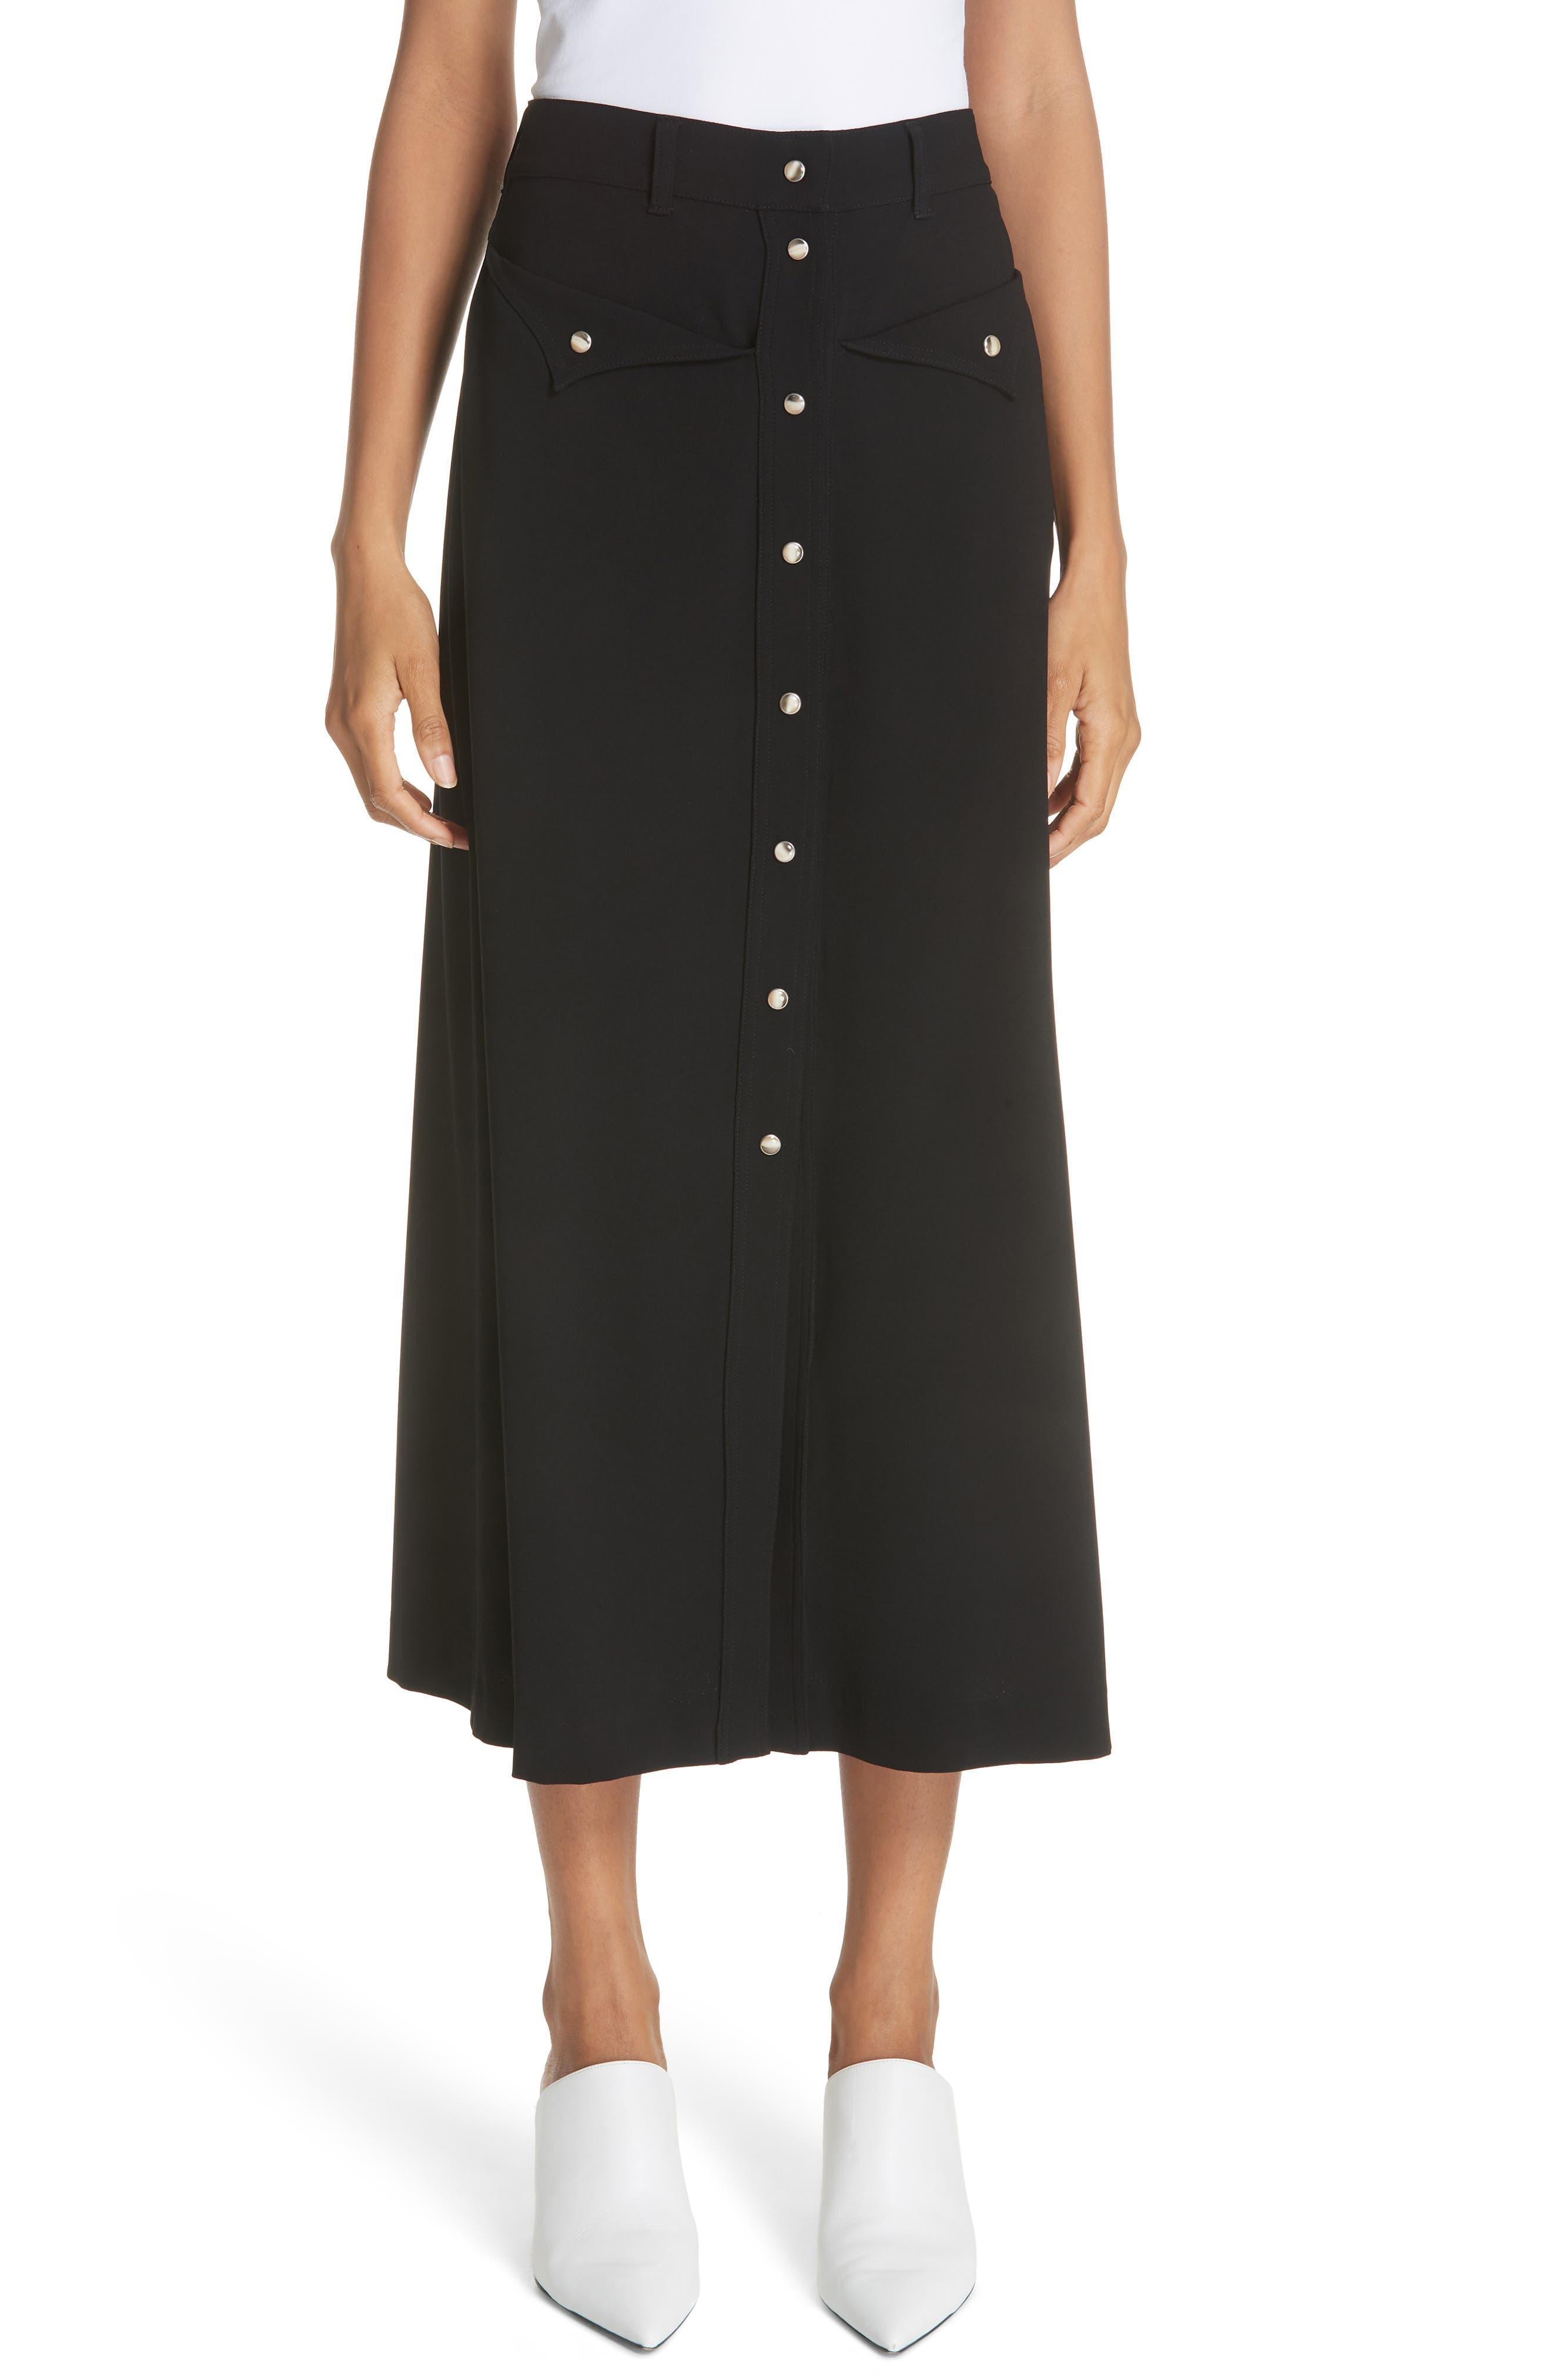 Meida Midi Skirt,                             Main thumbnail 1, color,                             003